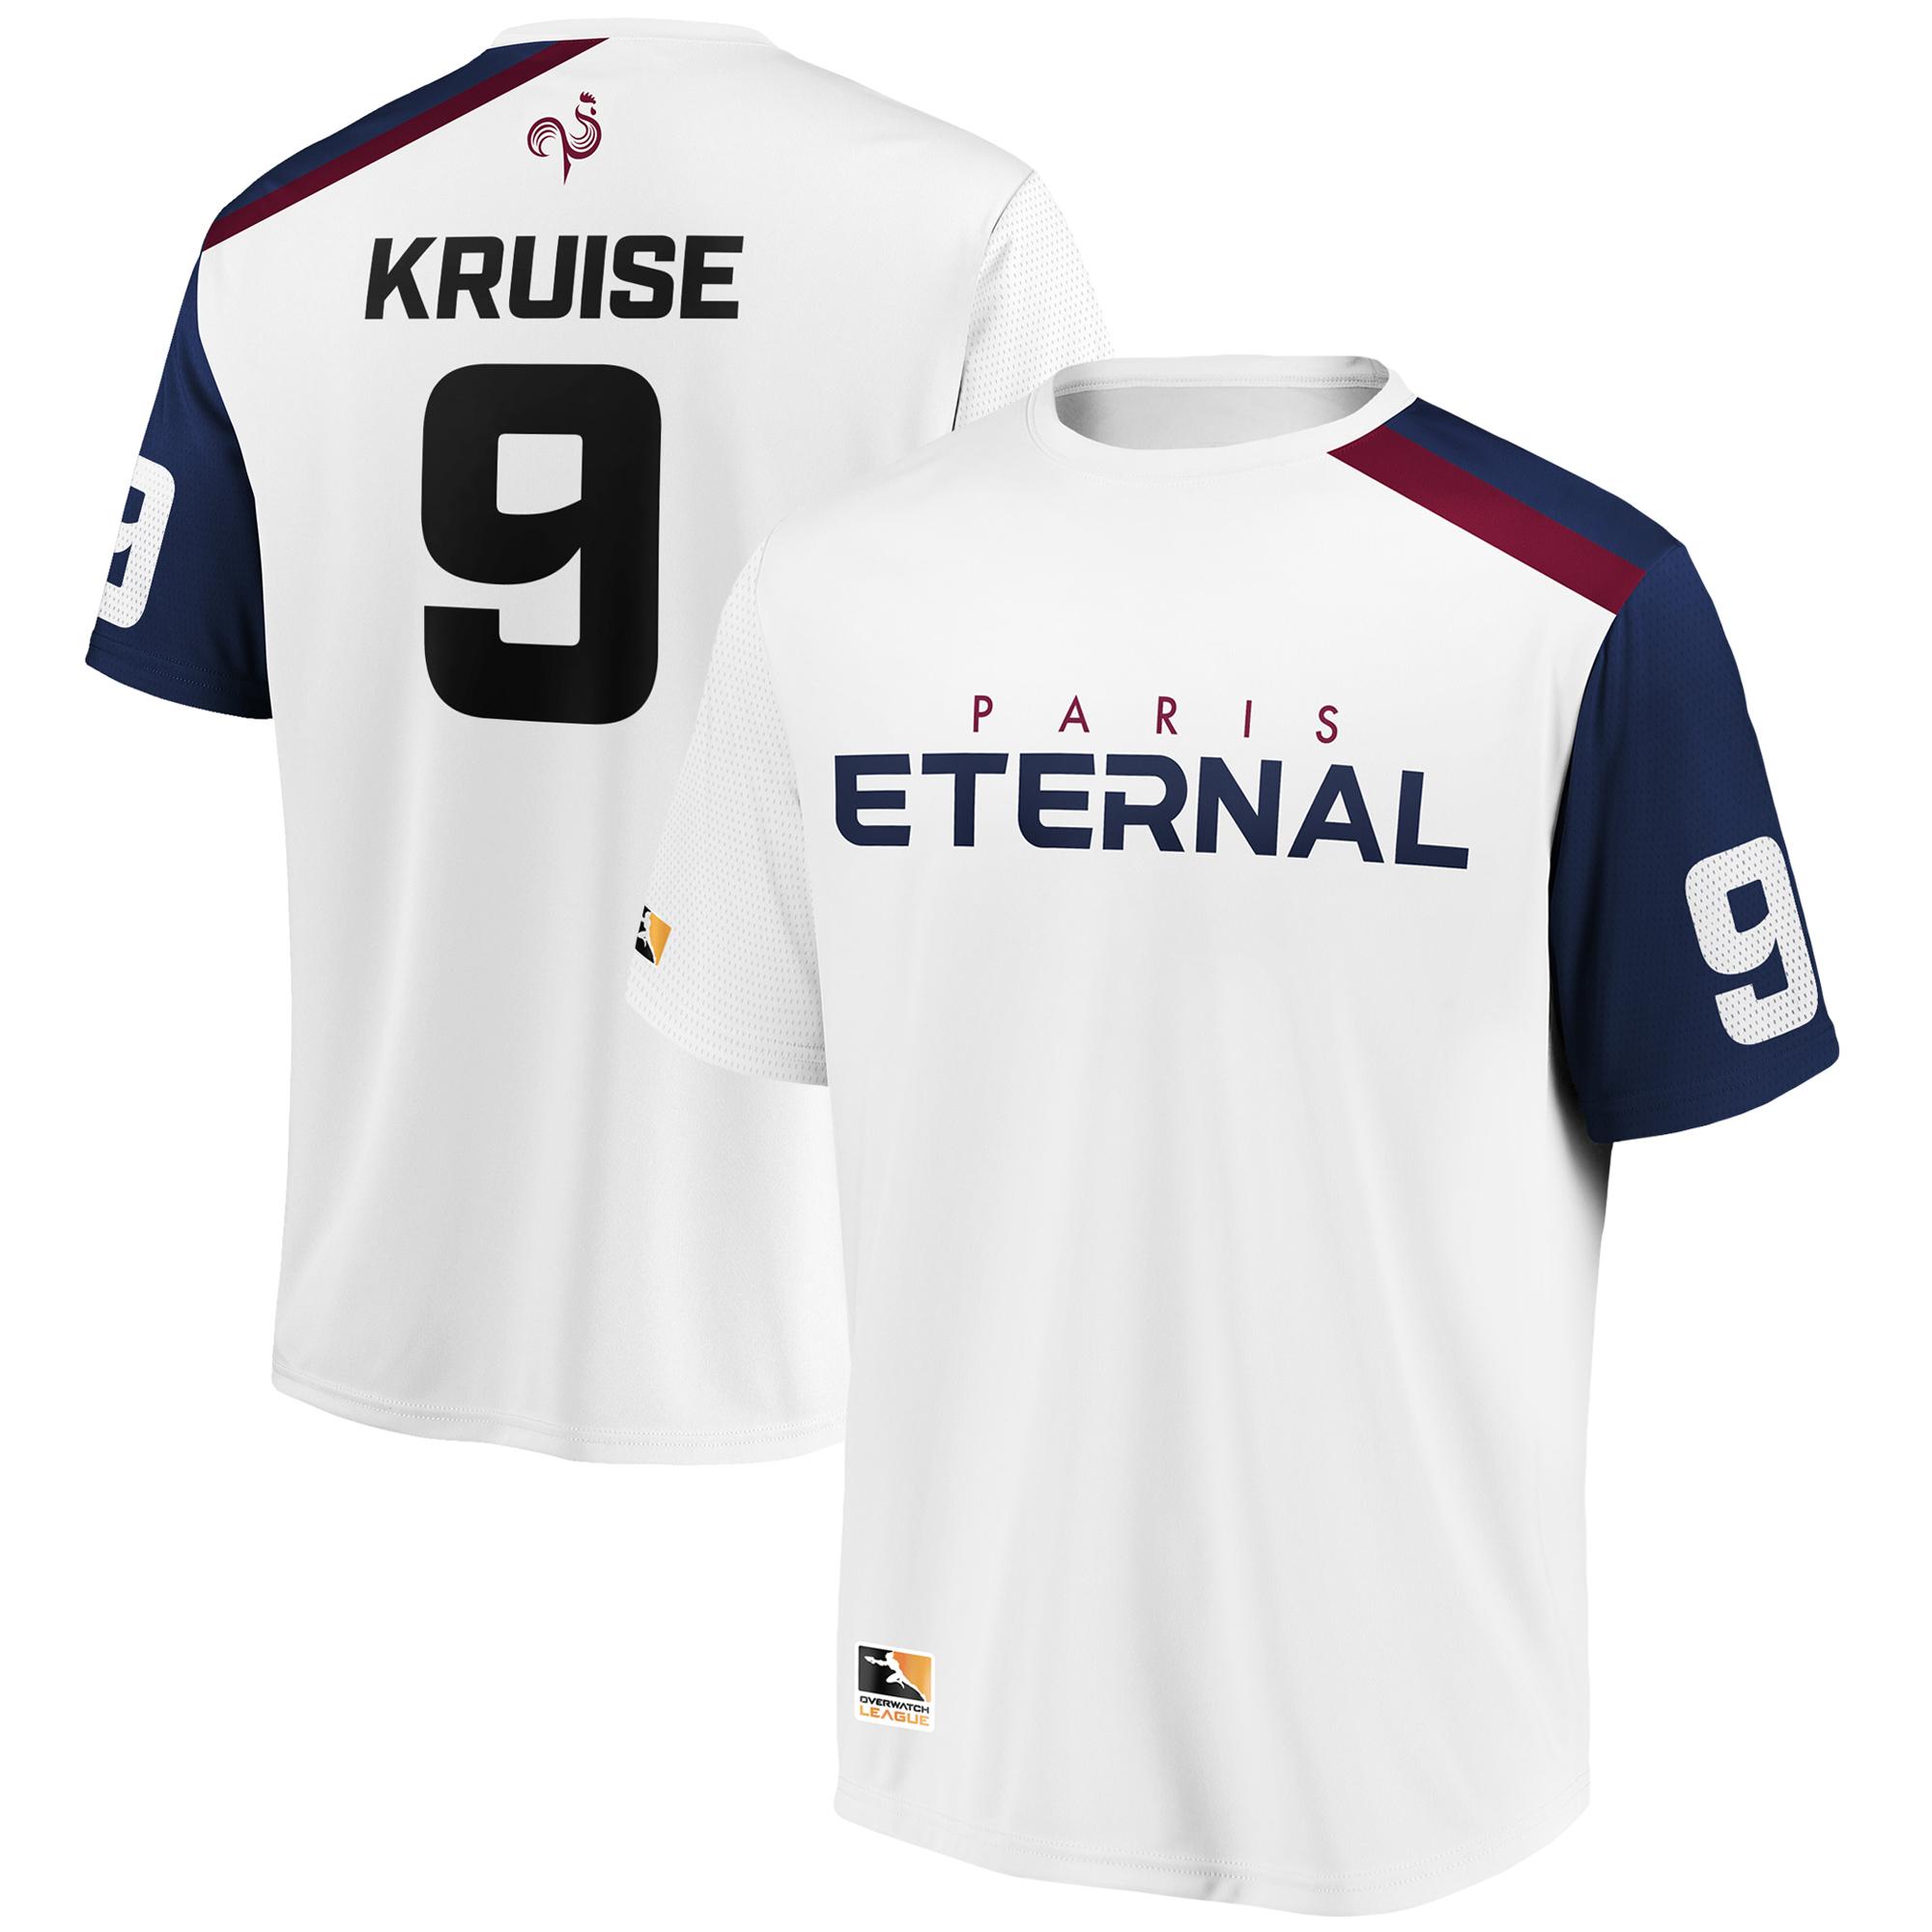 Kruise Paris Eternal Overwatch League Replica Away Jersey - White